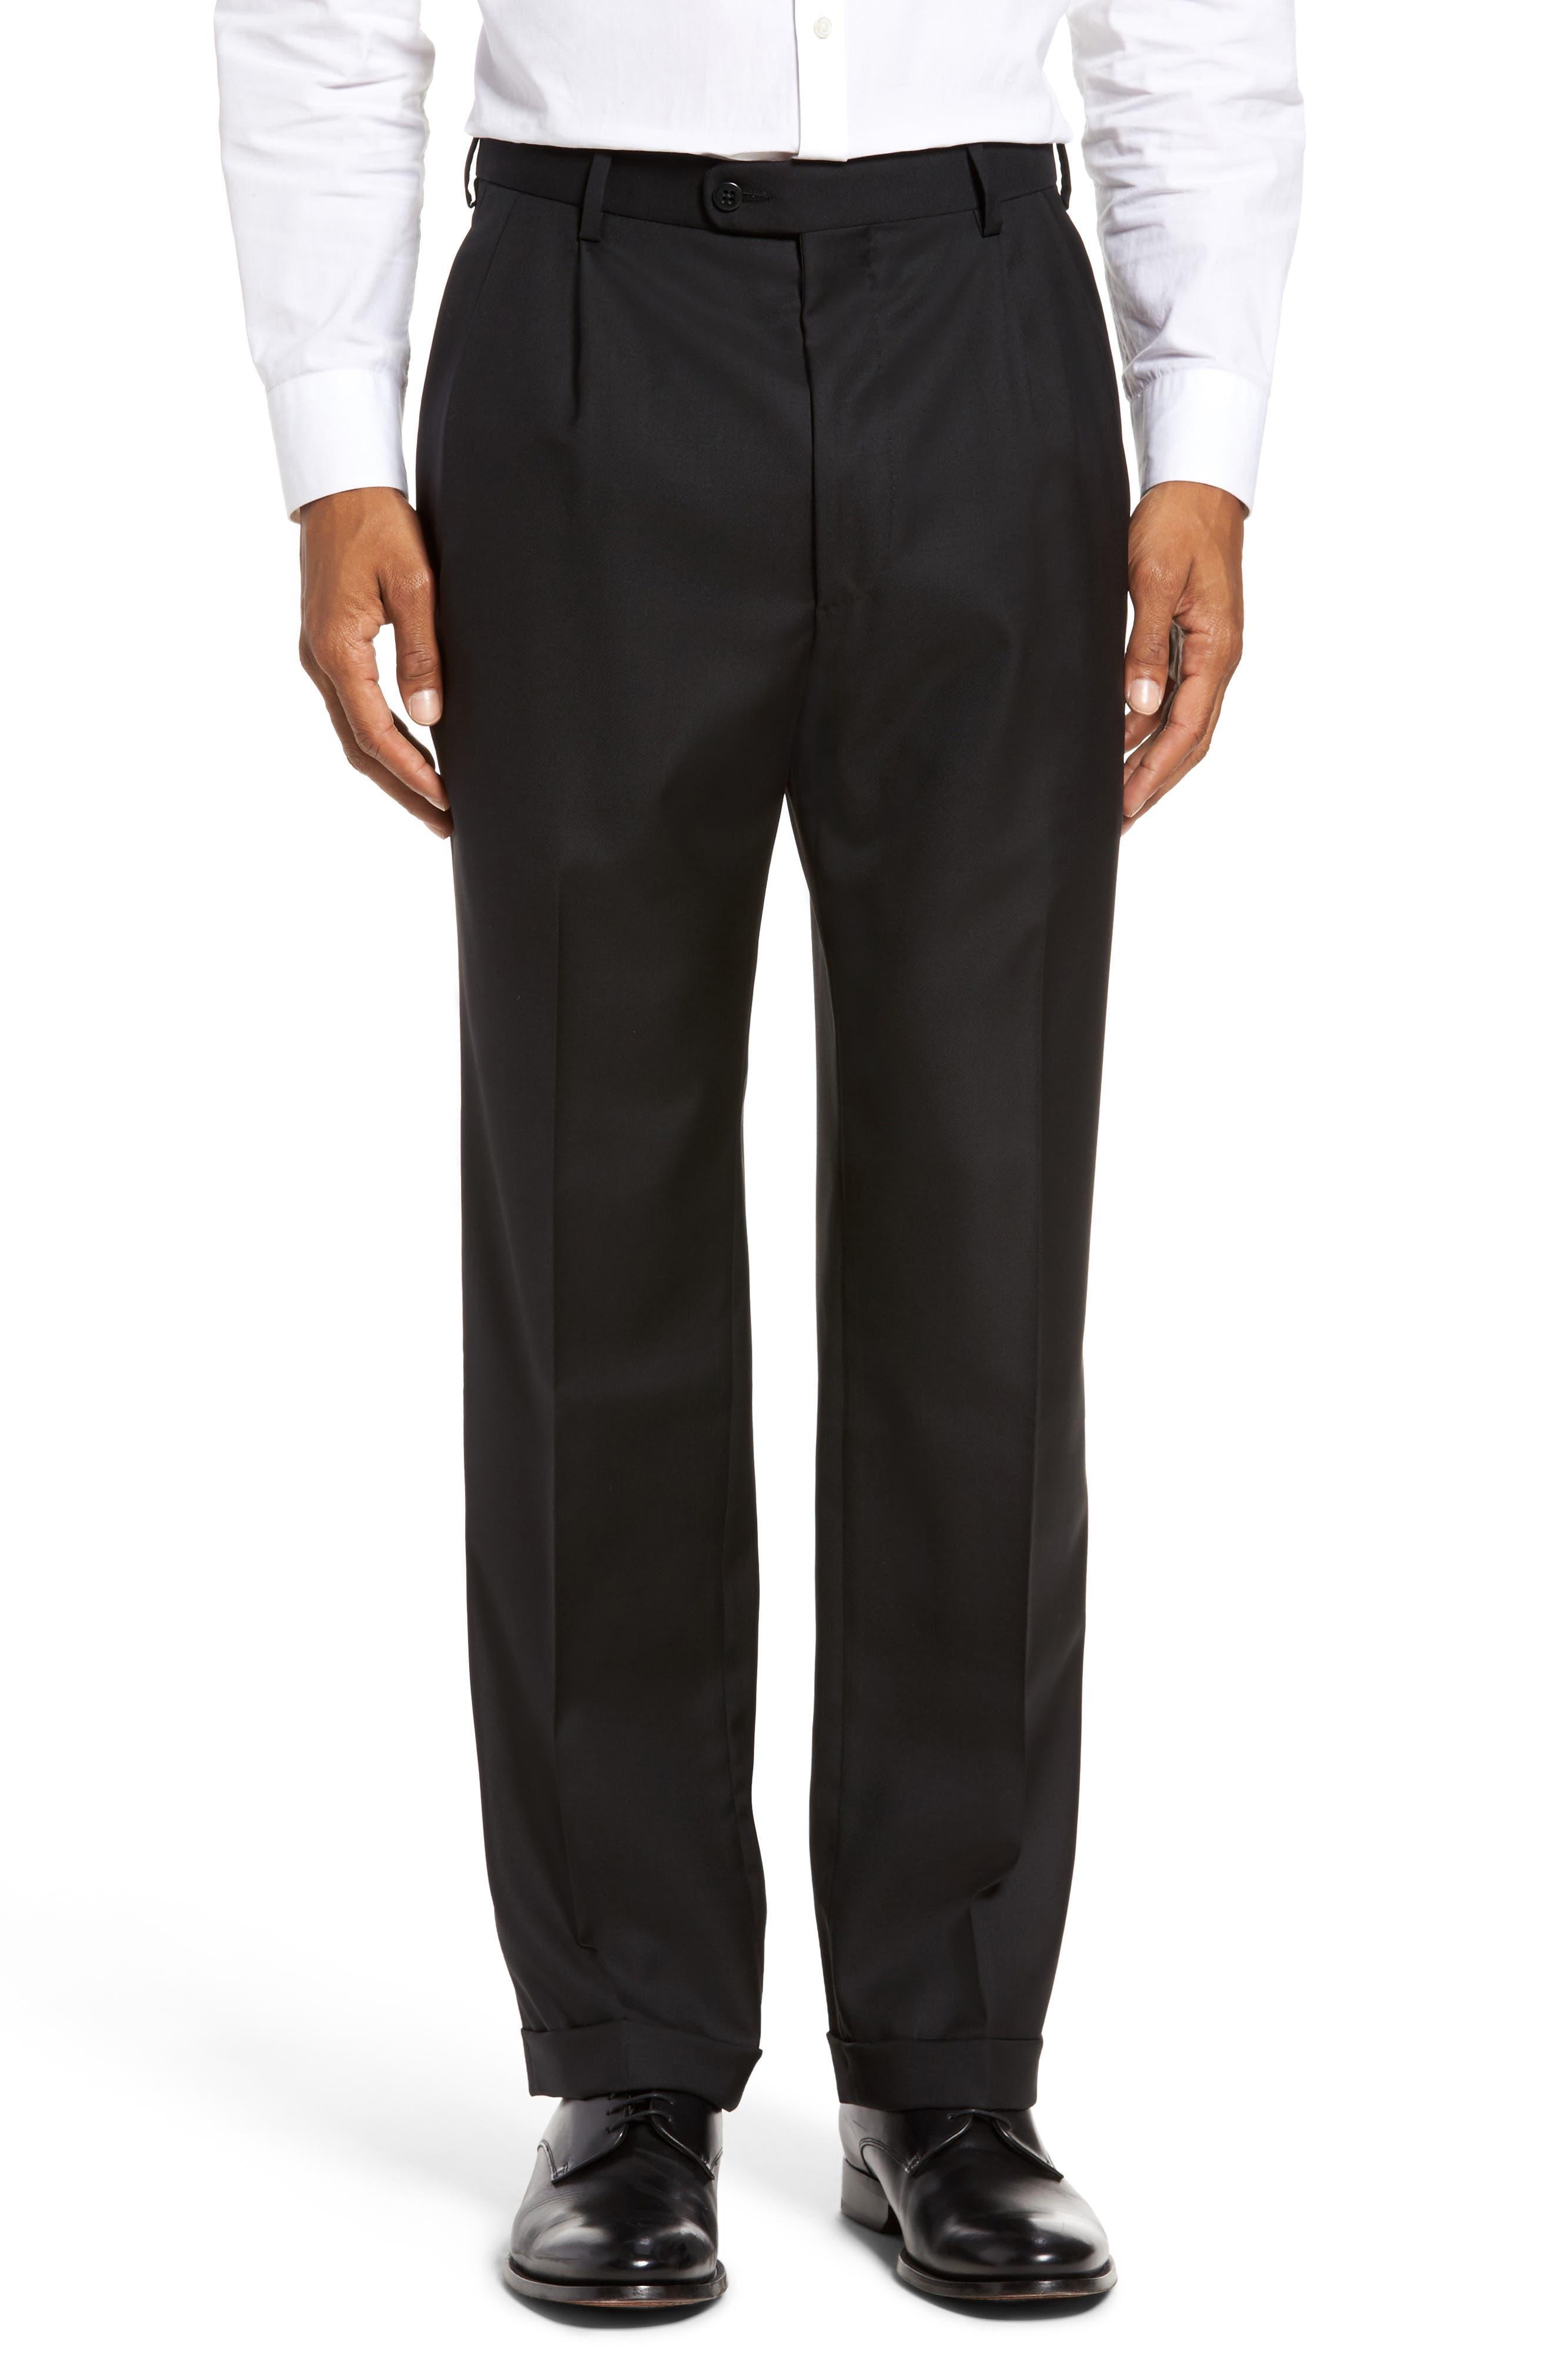 Bennett Regular Fit Pleated Trousers,                         Main,                         color, Black